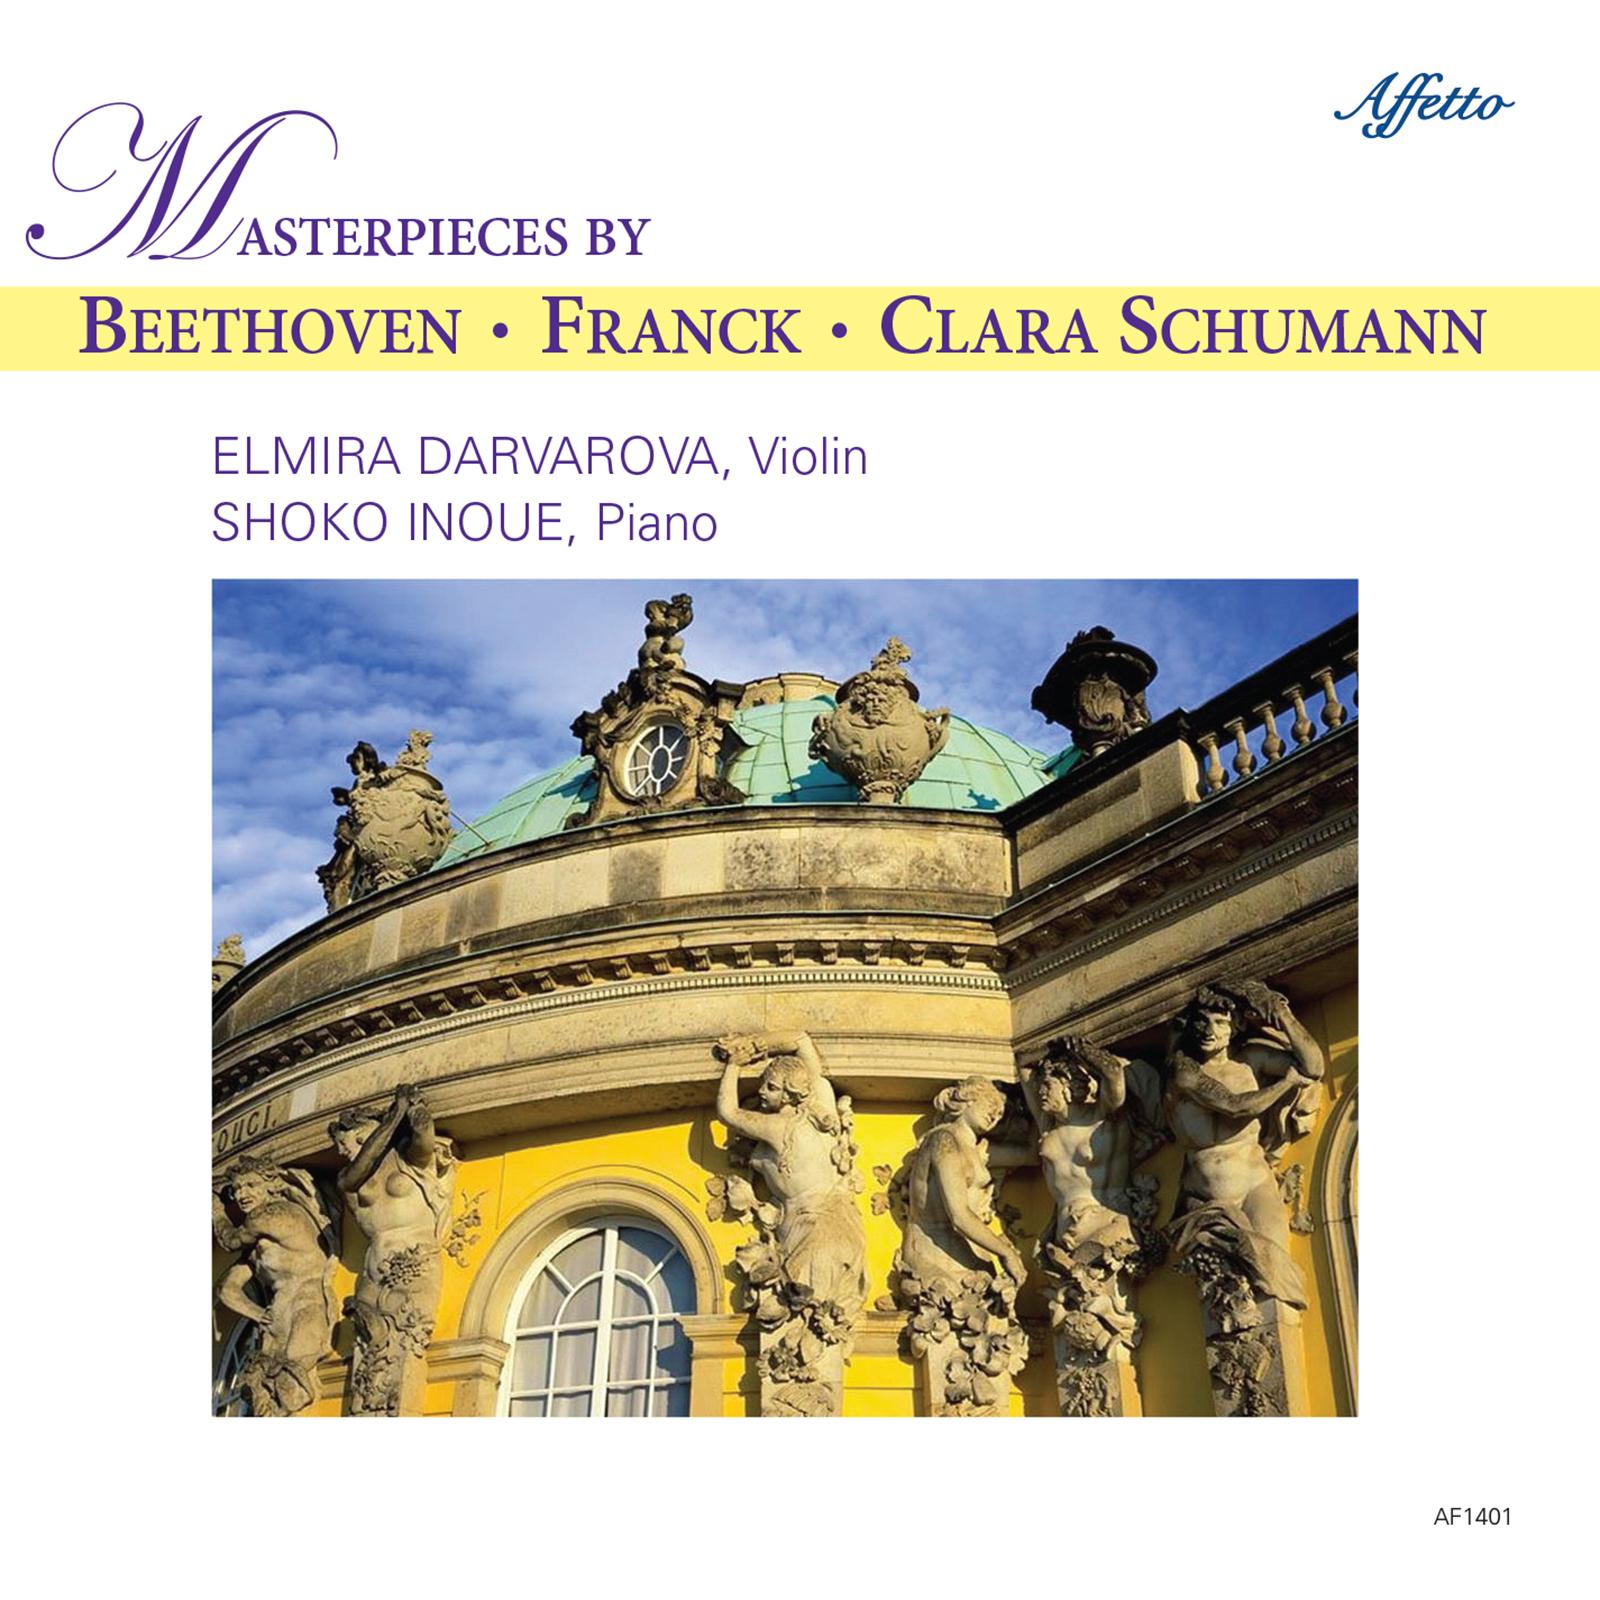 Masterpieces By Beethoven, Franck, and Clara Schumann – Elmira Darvarova, Violin & Shoko Inoue, Piano